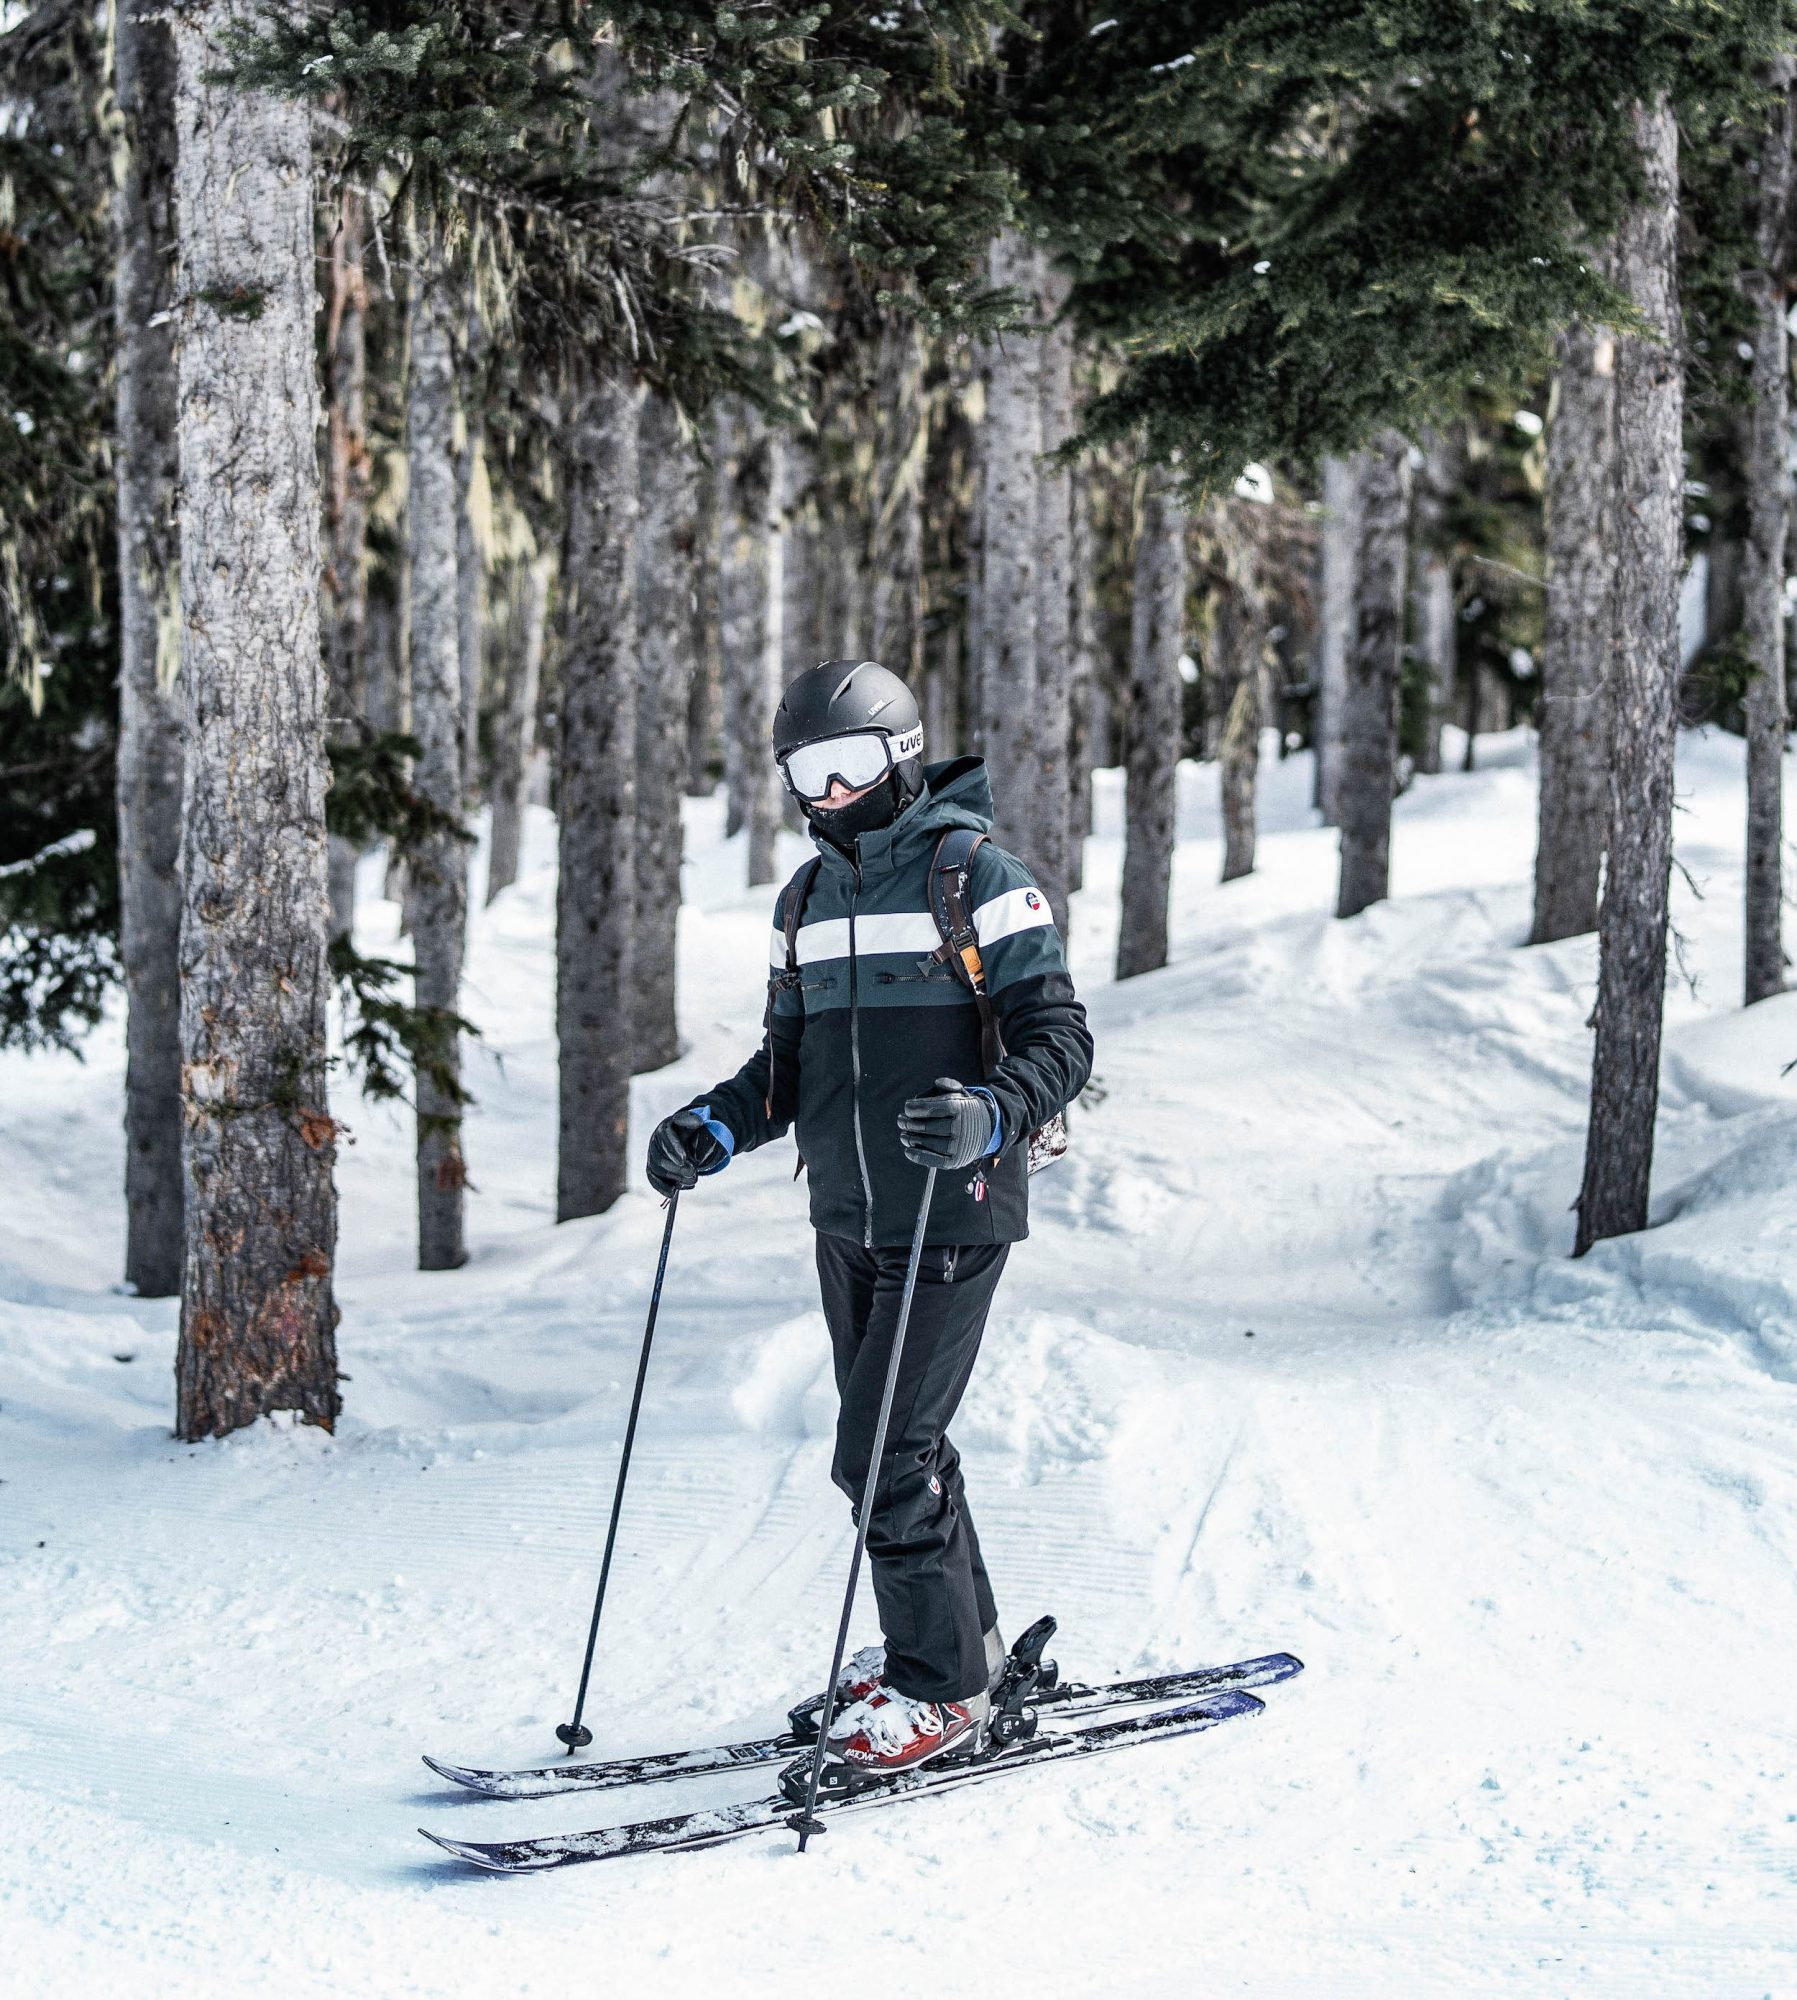 skier a whistler